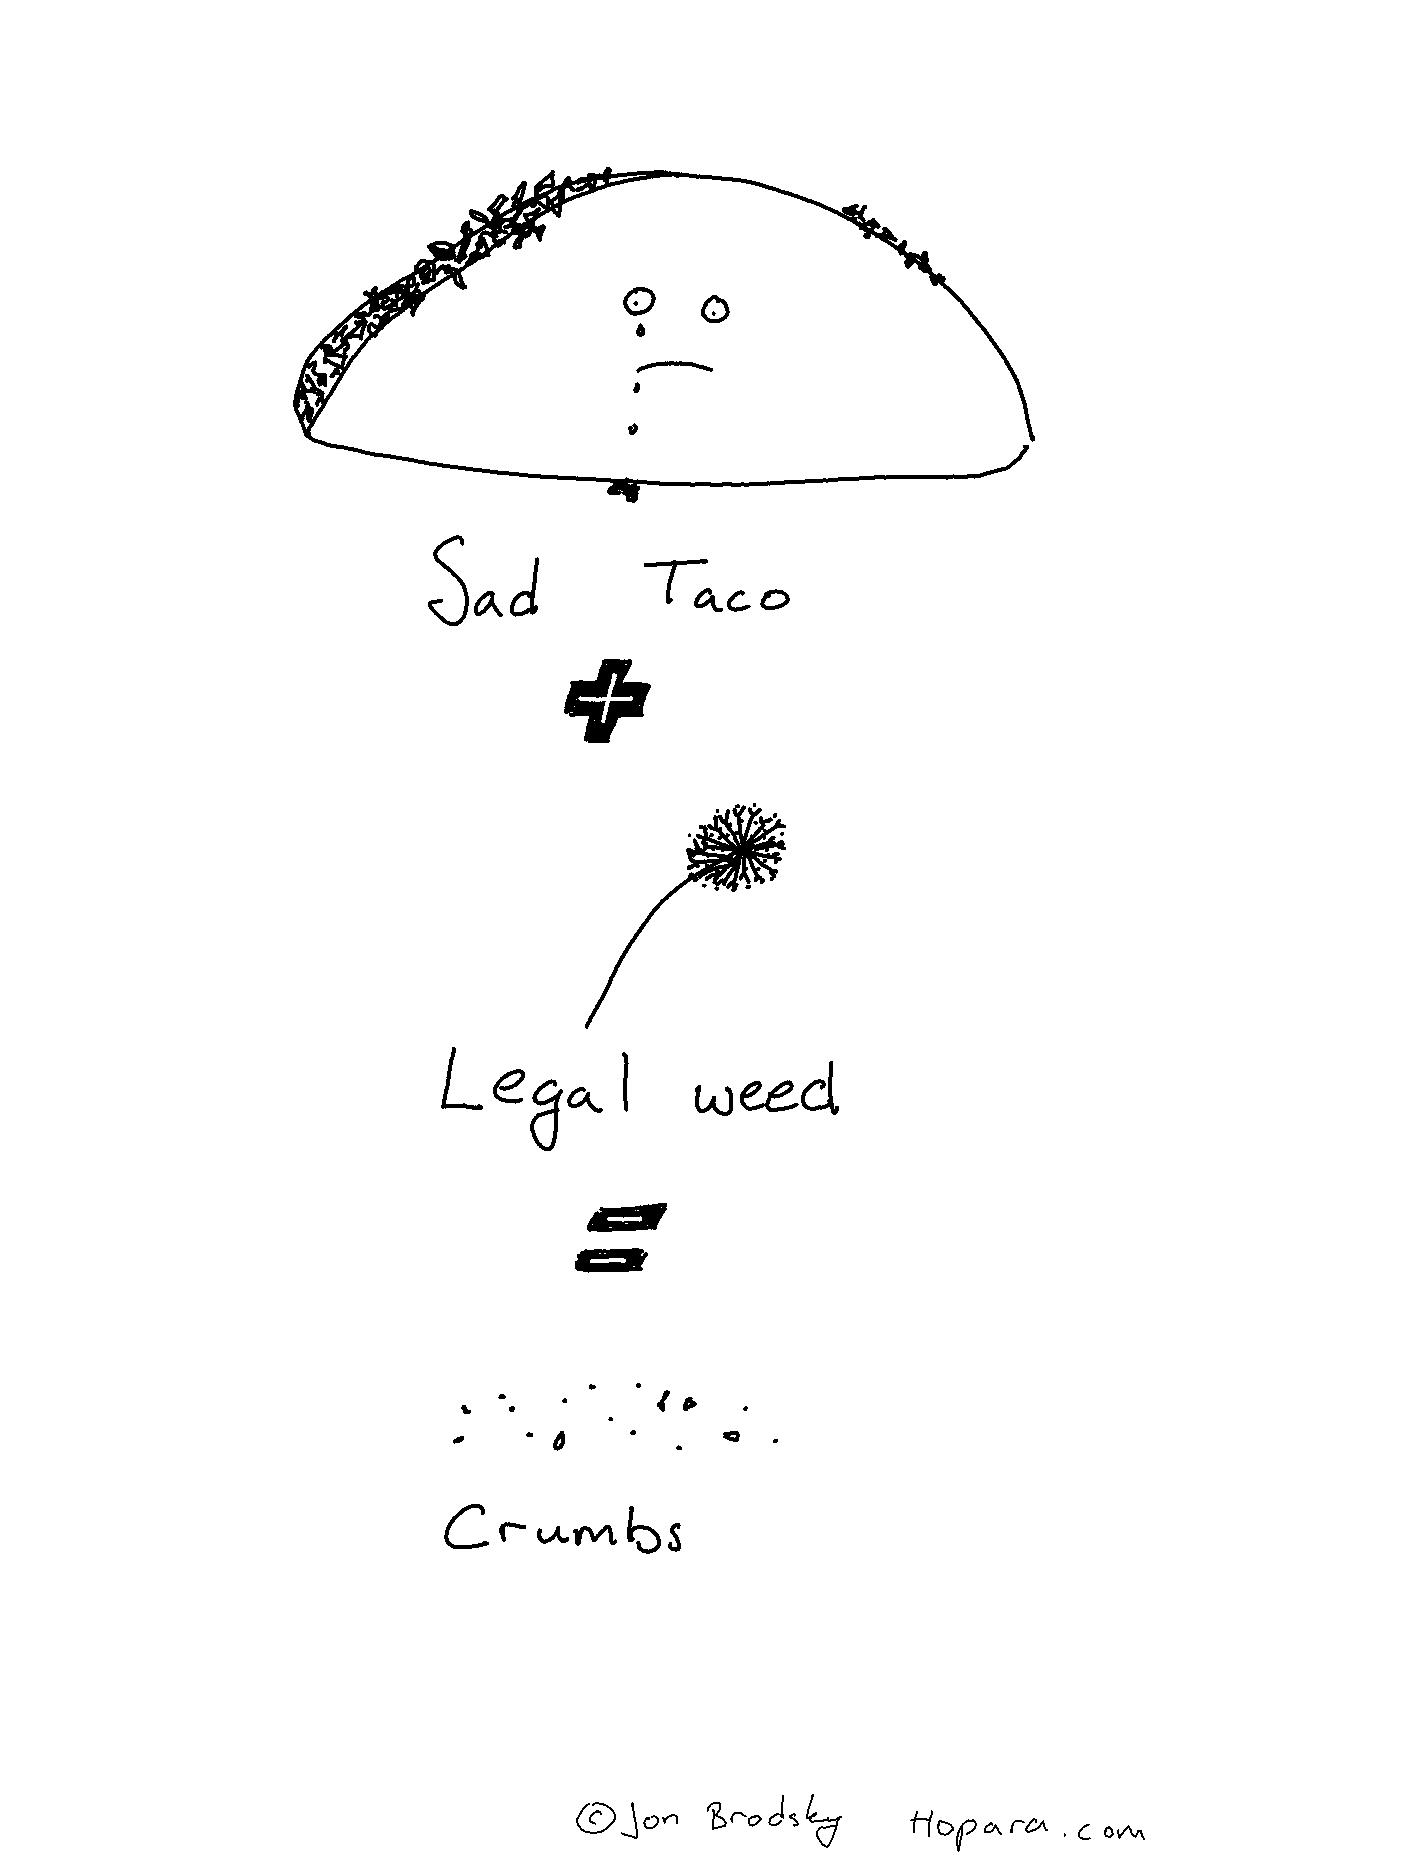 sad taco plus legal weed equals crumbs copyright jon brodsky hopara.com